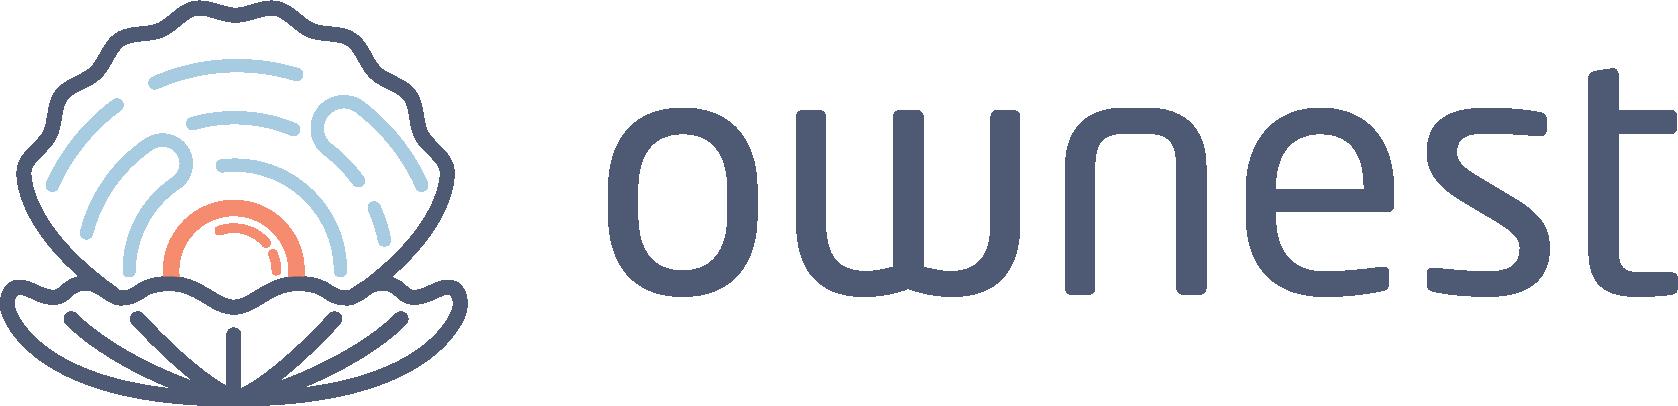 ownest-nft-blockchain-logo-pearl